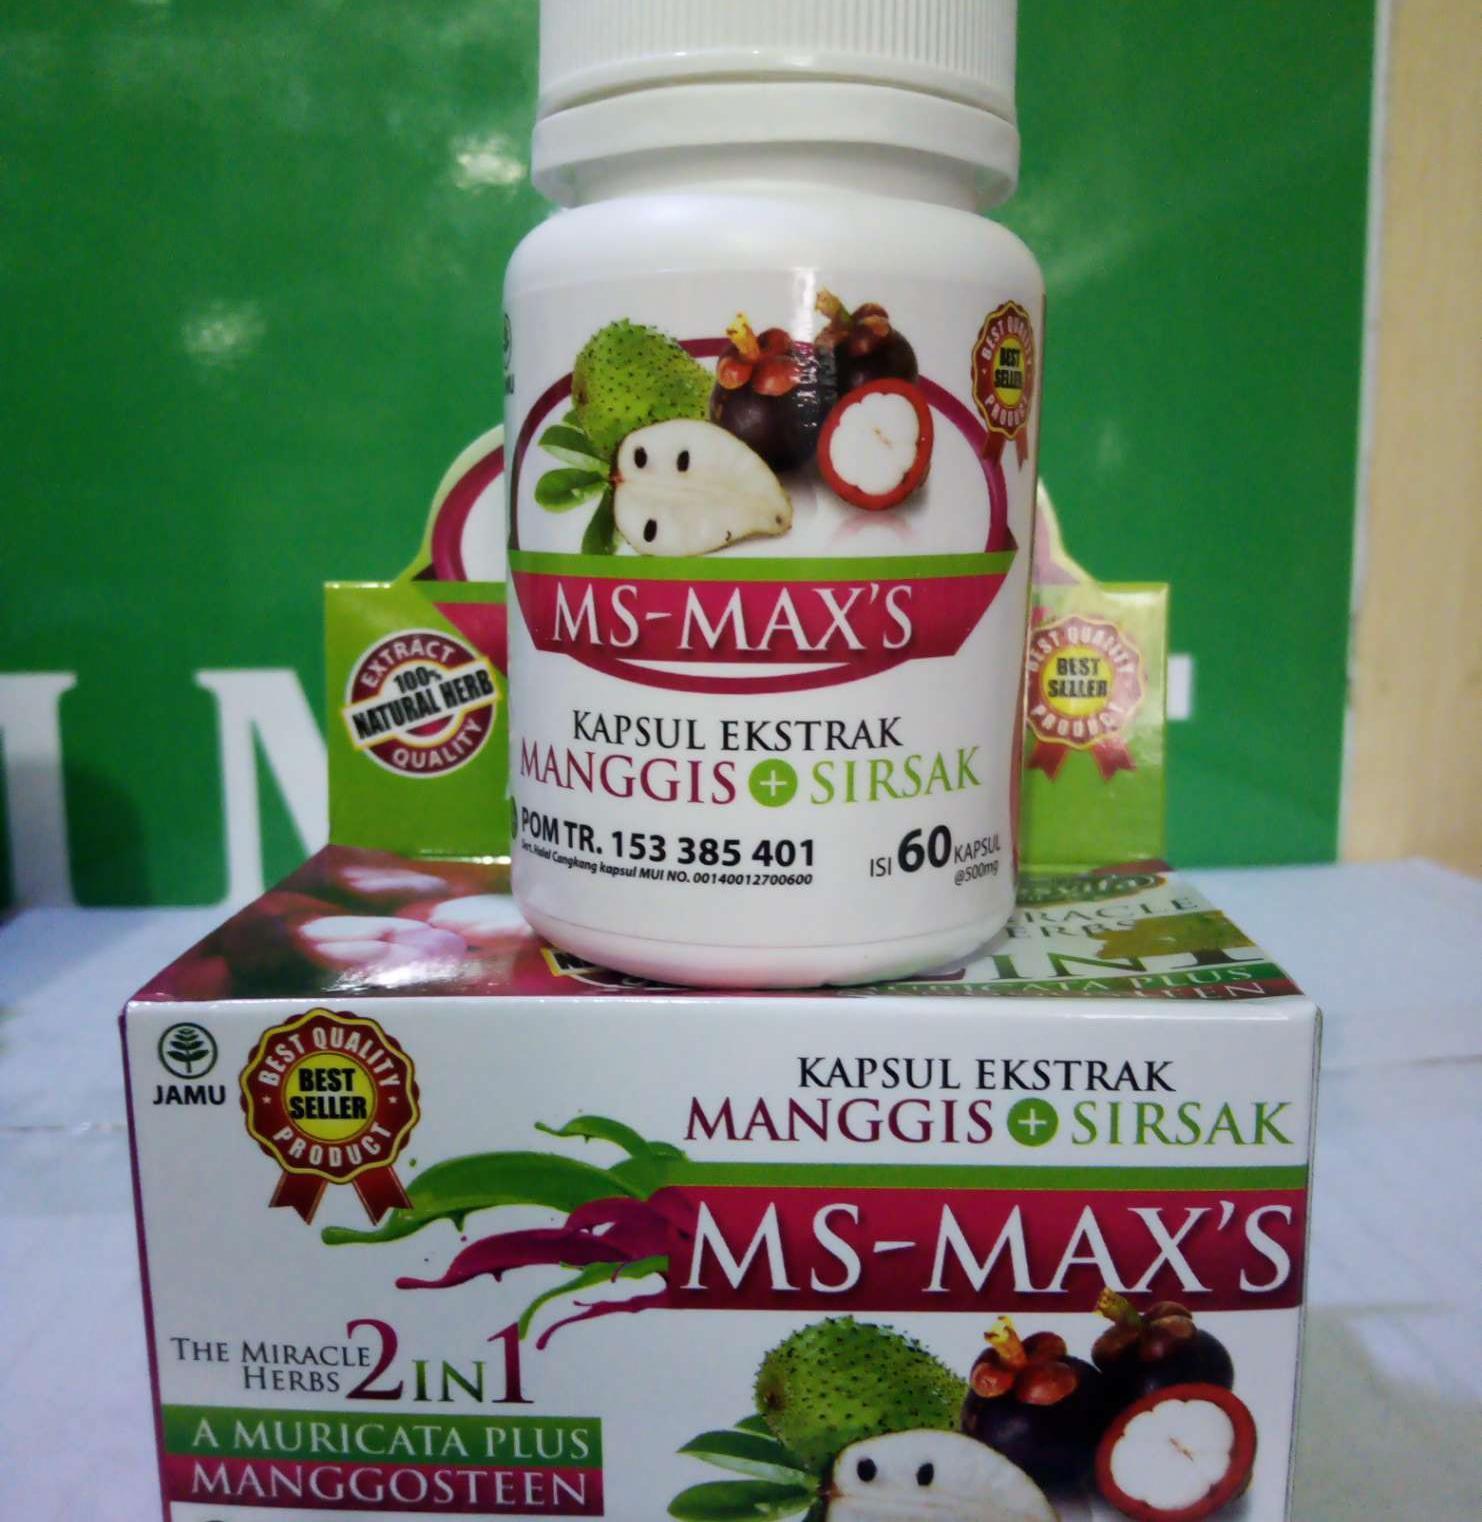 Jual 2 Bok Kapsul Bawang Garlic Maxs Darusyifa 60 Kps Harga Rp 96000 Ekstrak Pegagan Smart Brain Centella Ms Manggis Sirsak